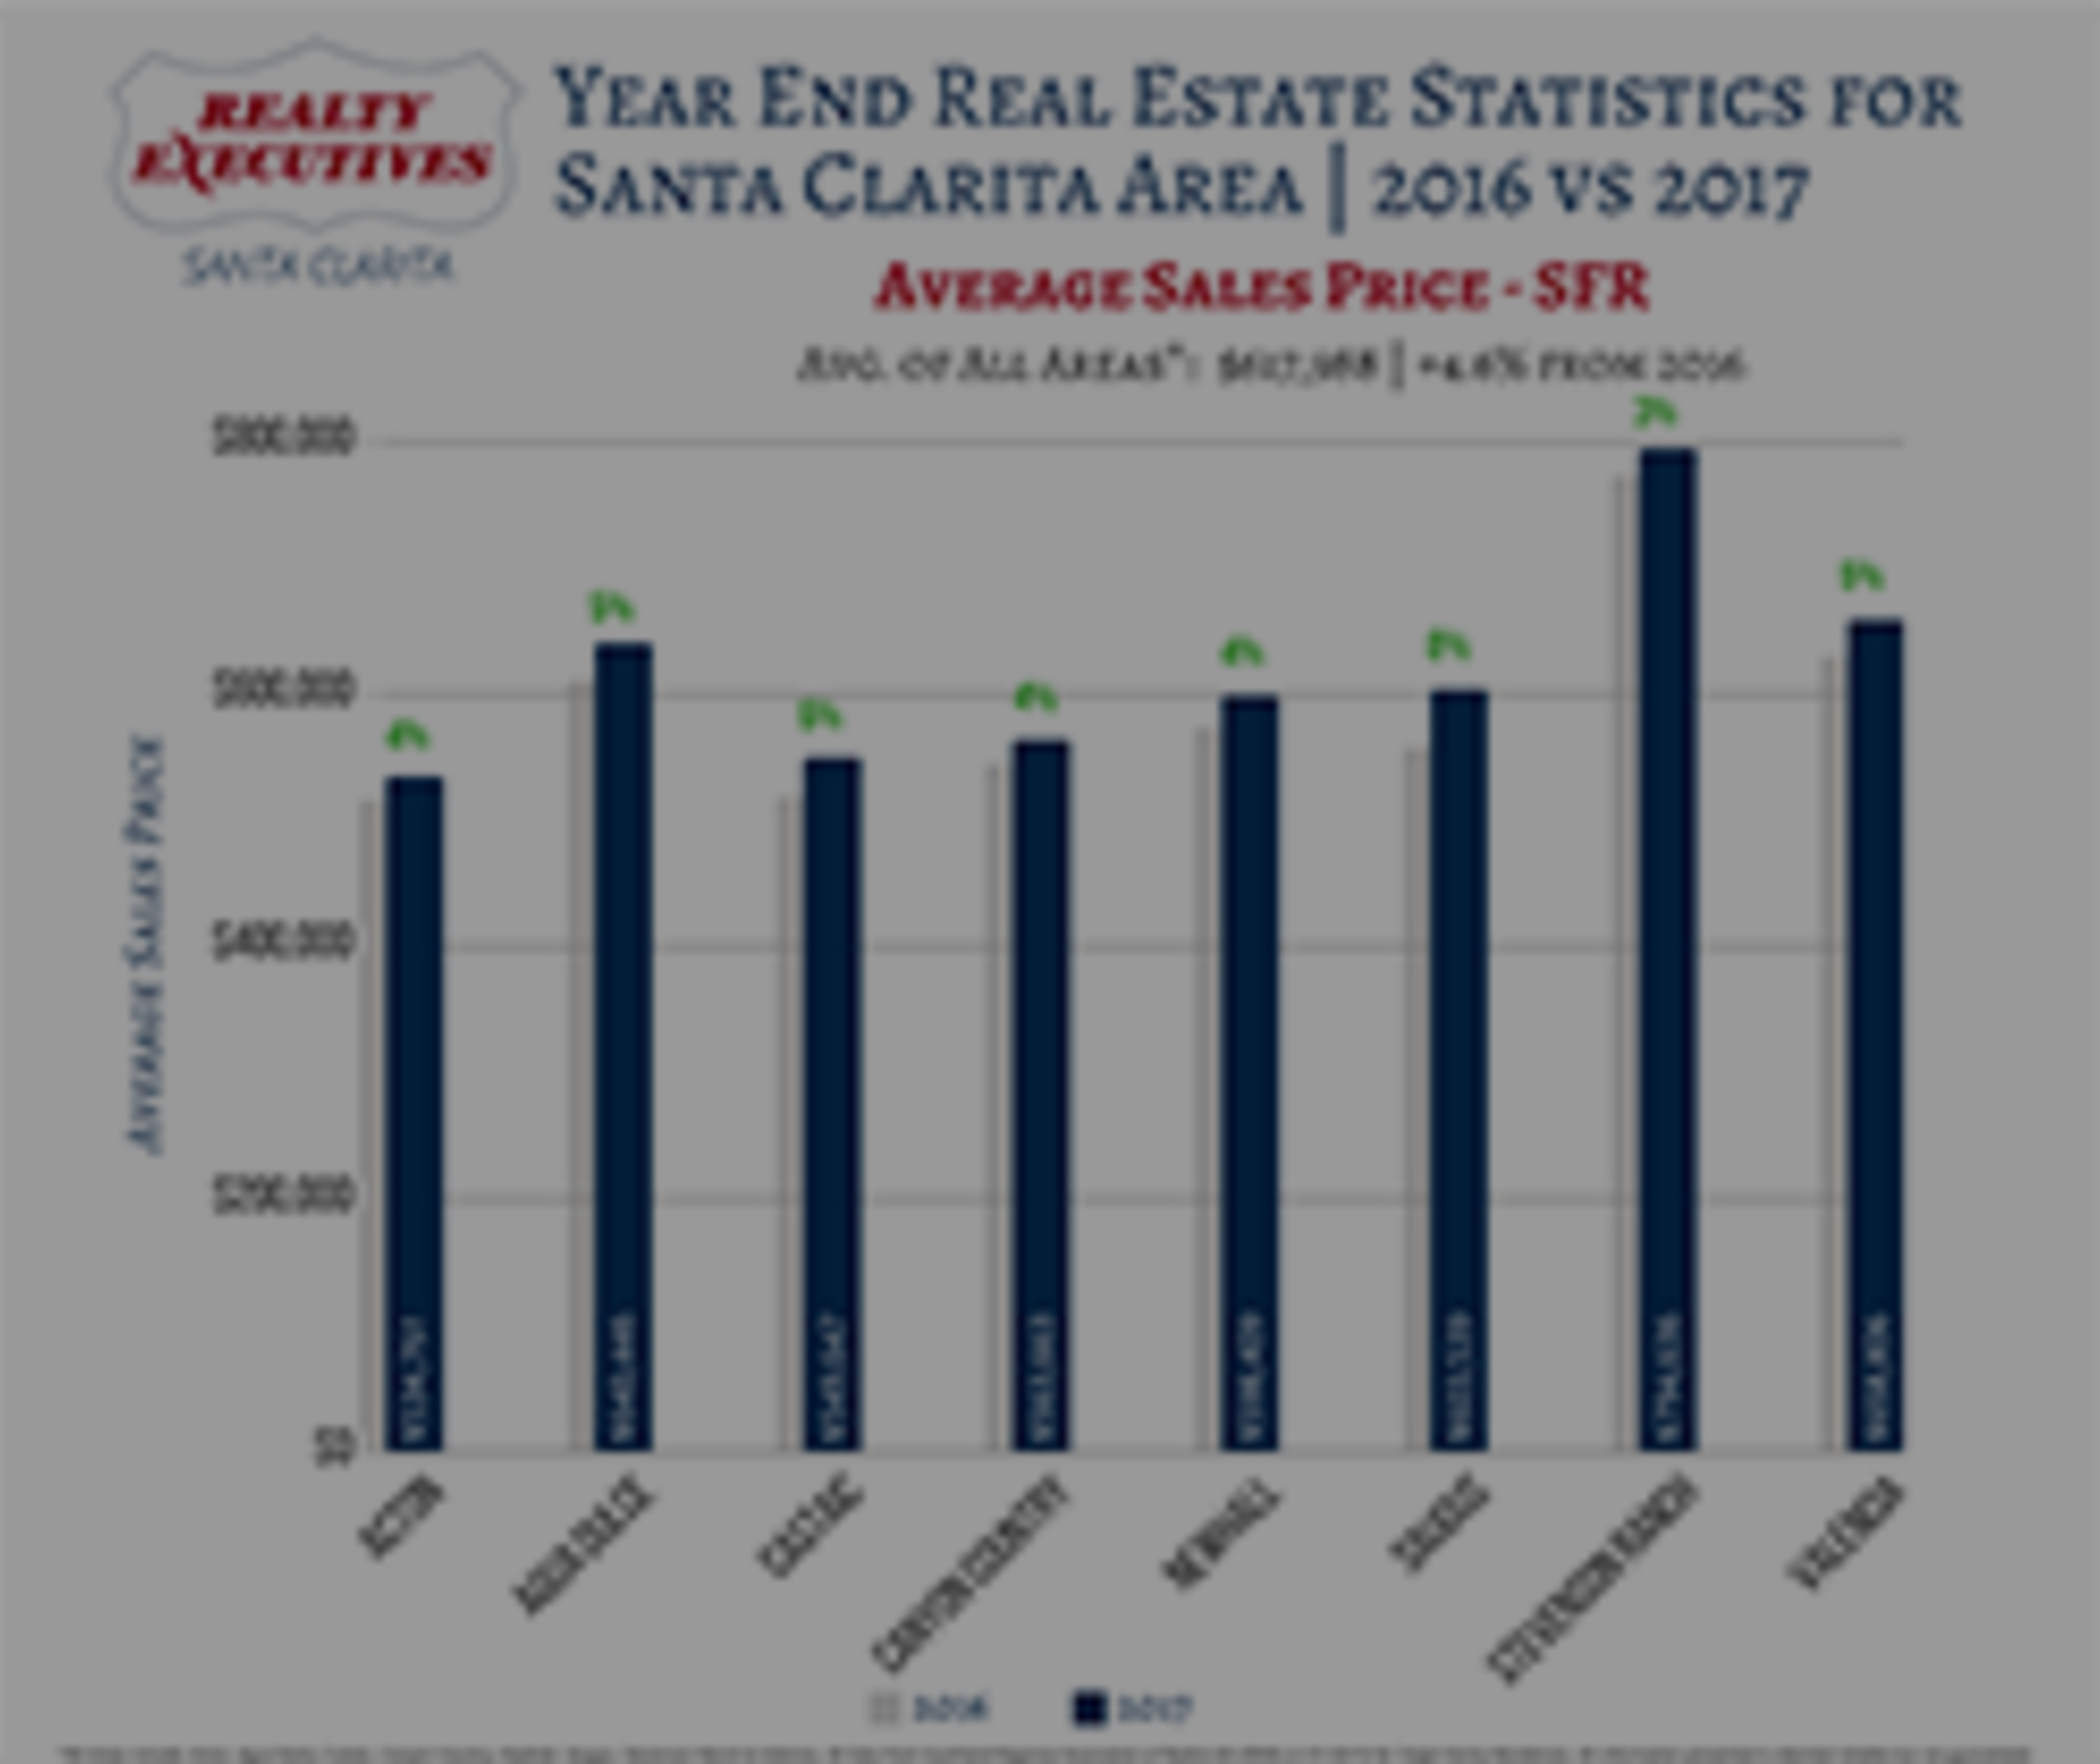 2017 Real Estate Statistics | Santa Clarita Valley Area